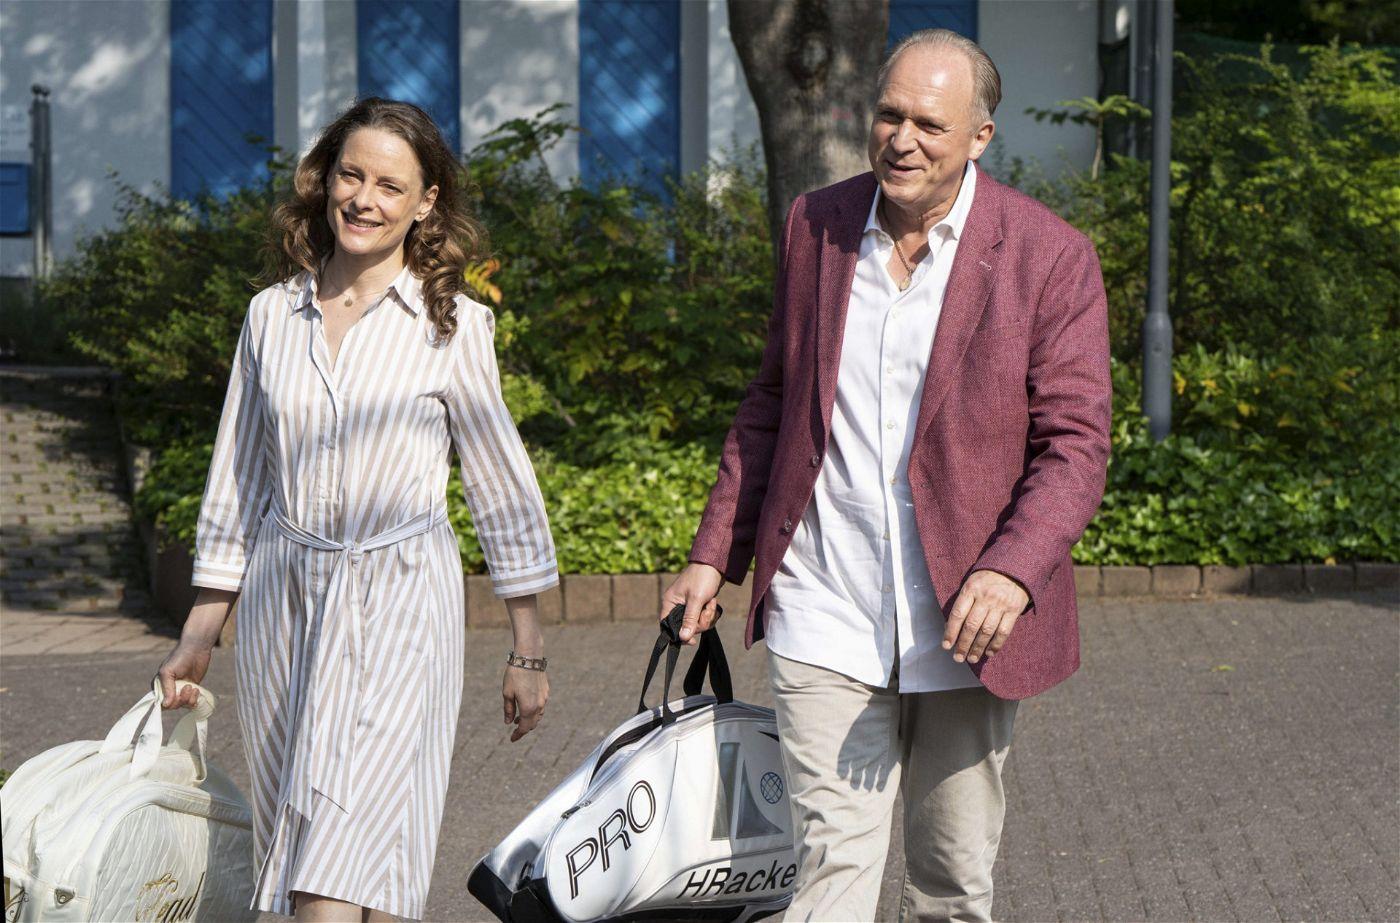 Anne Ratte-Polle (Monika Boenfeld), Ulrich Tukur (Felix Murot/Walter Boenfeld).